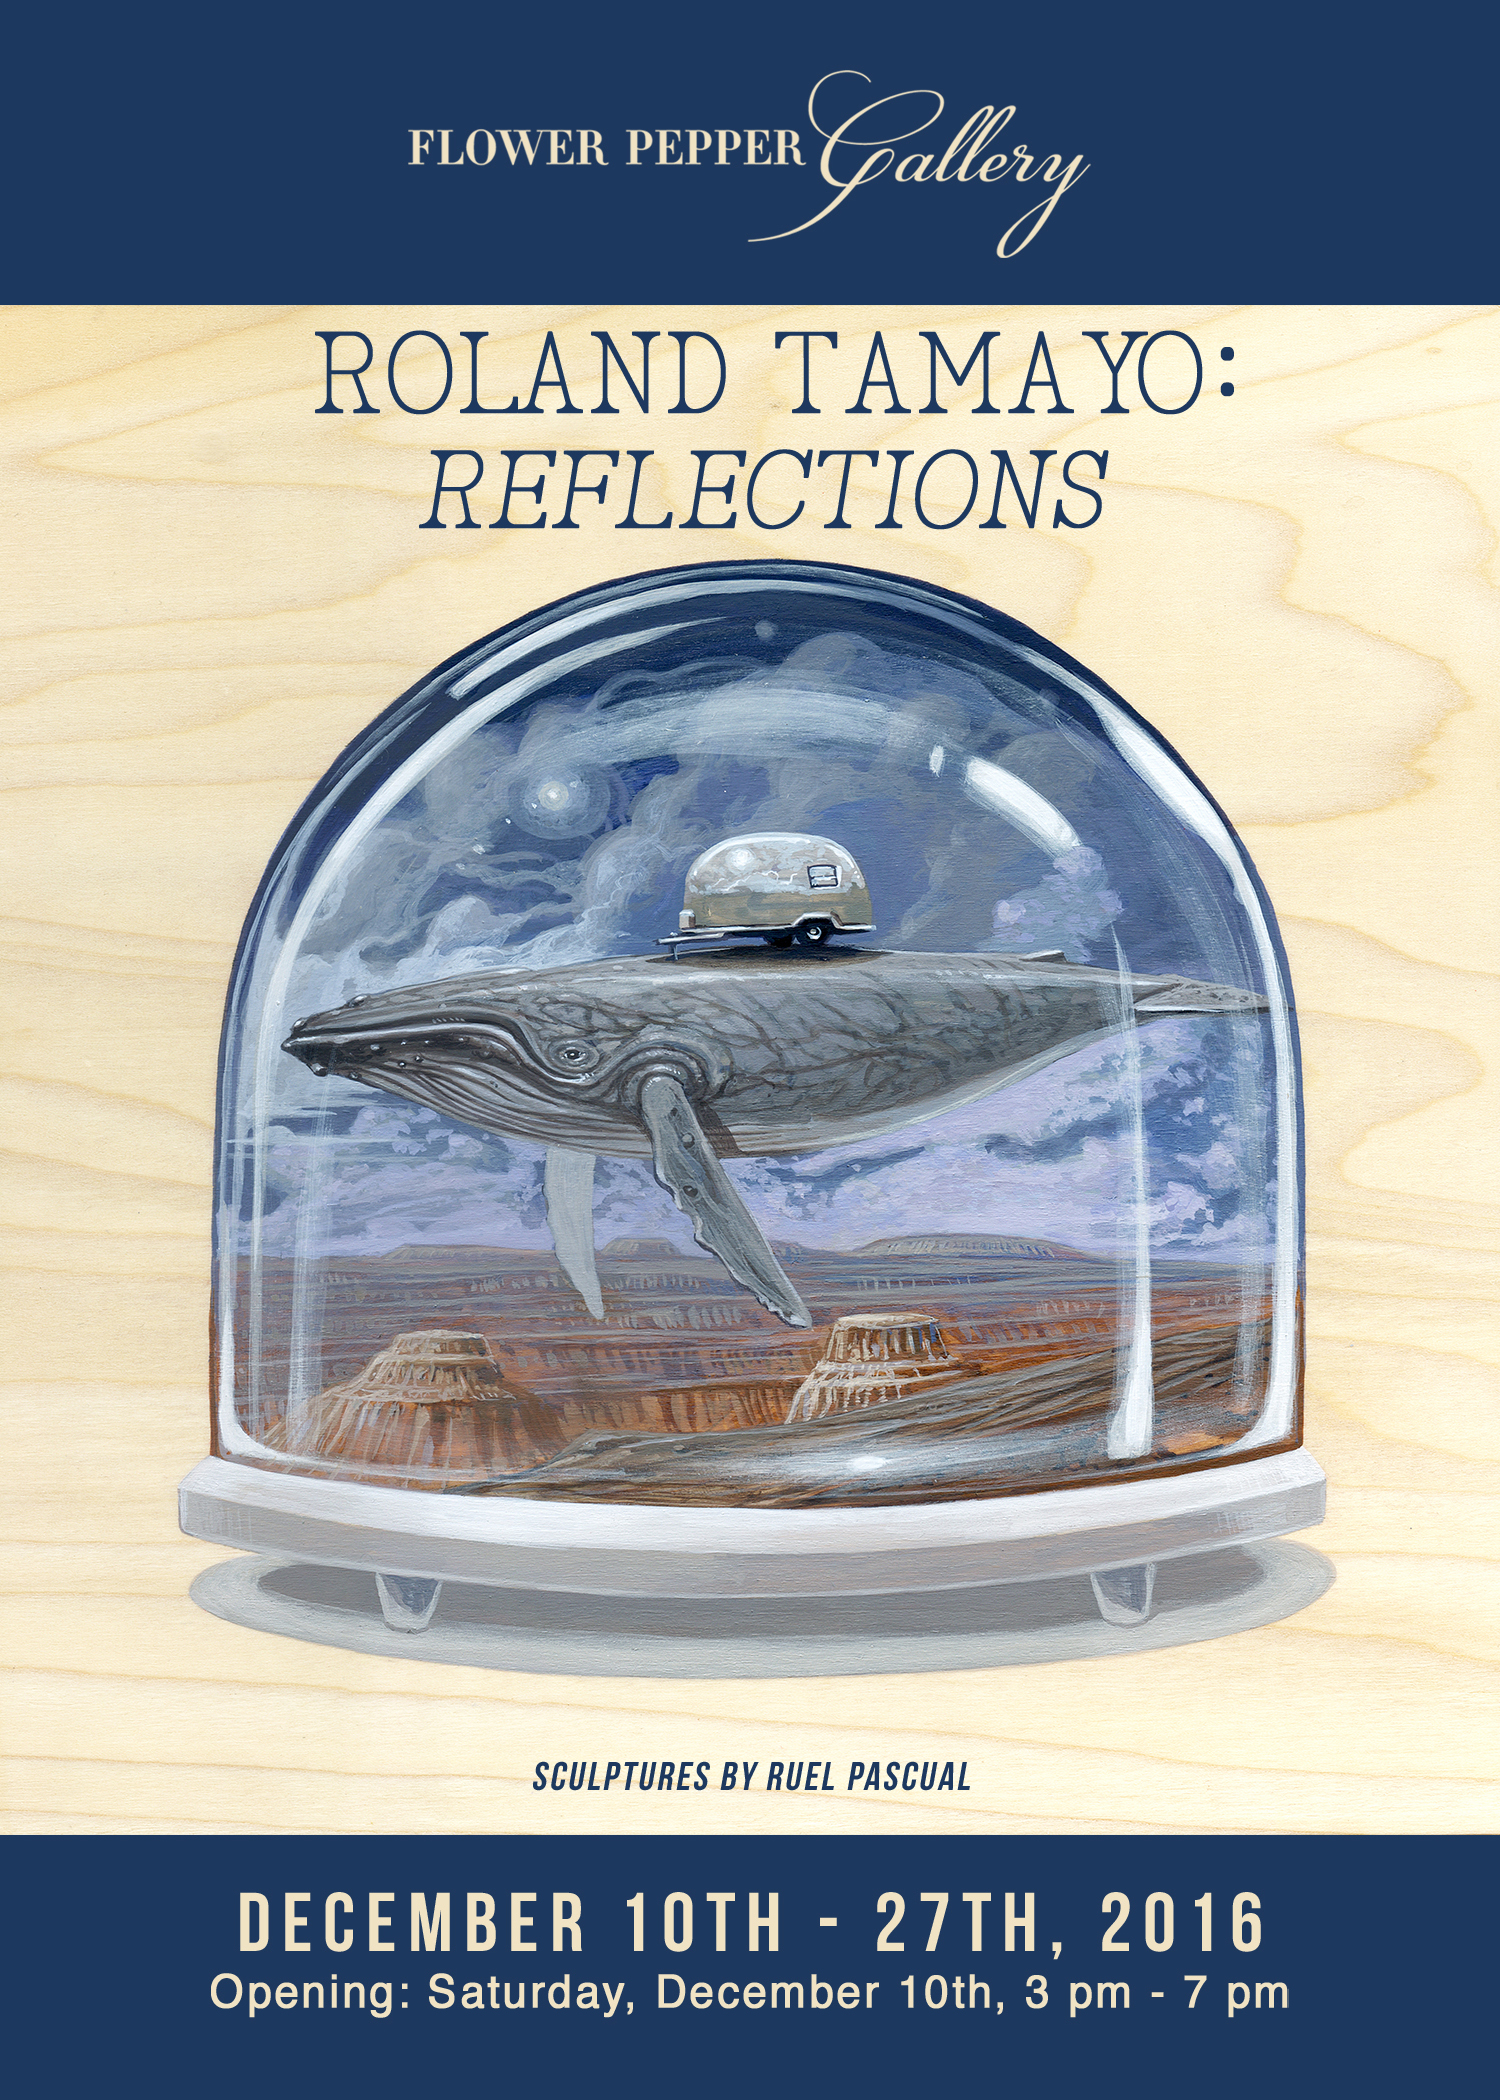 Roland Tamayo: Reflections